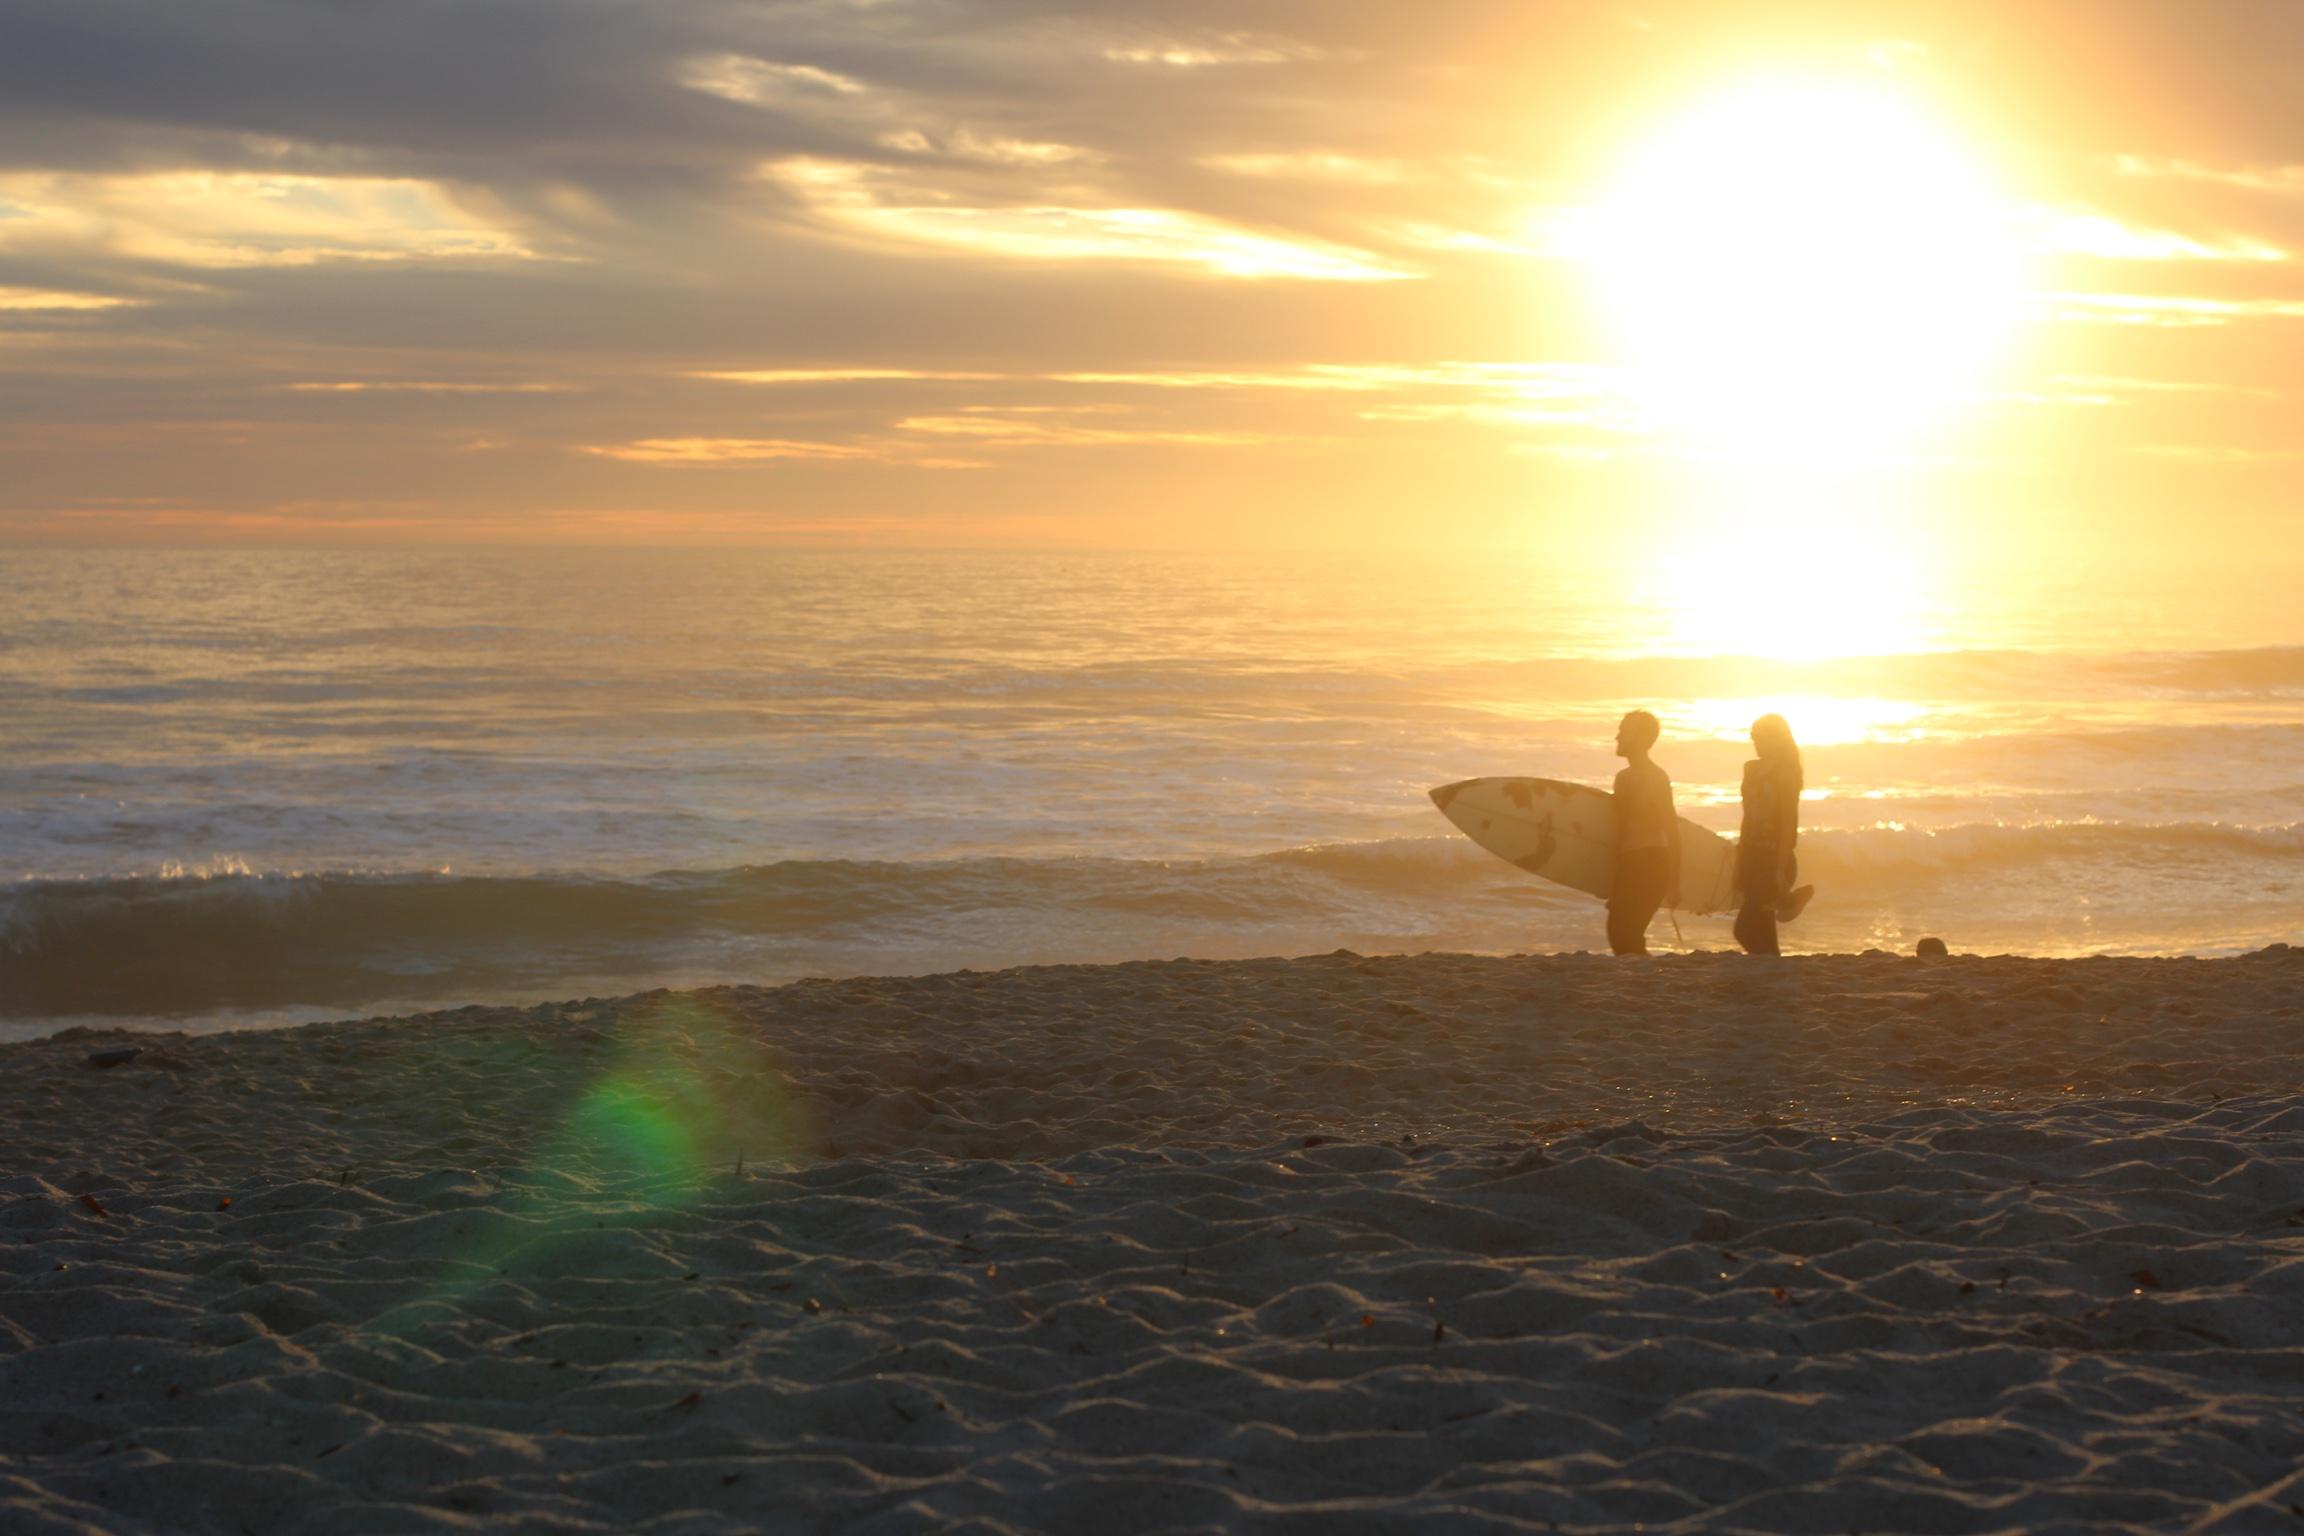 Santa Monica, CA - Spring 2015 - Shot on iPhone 6